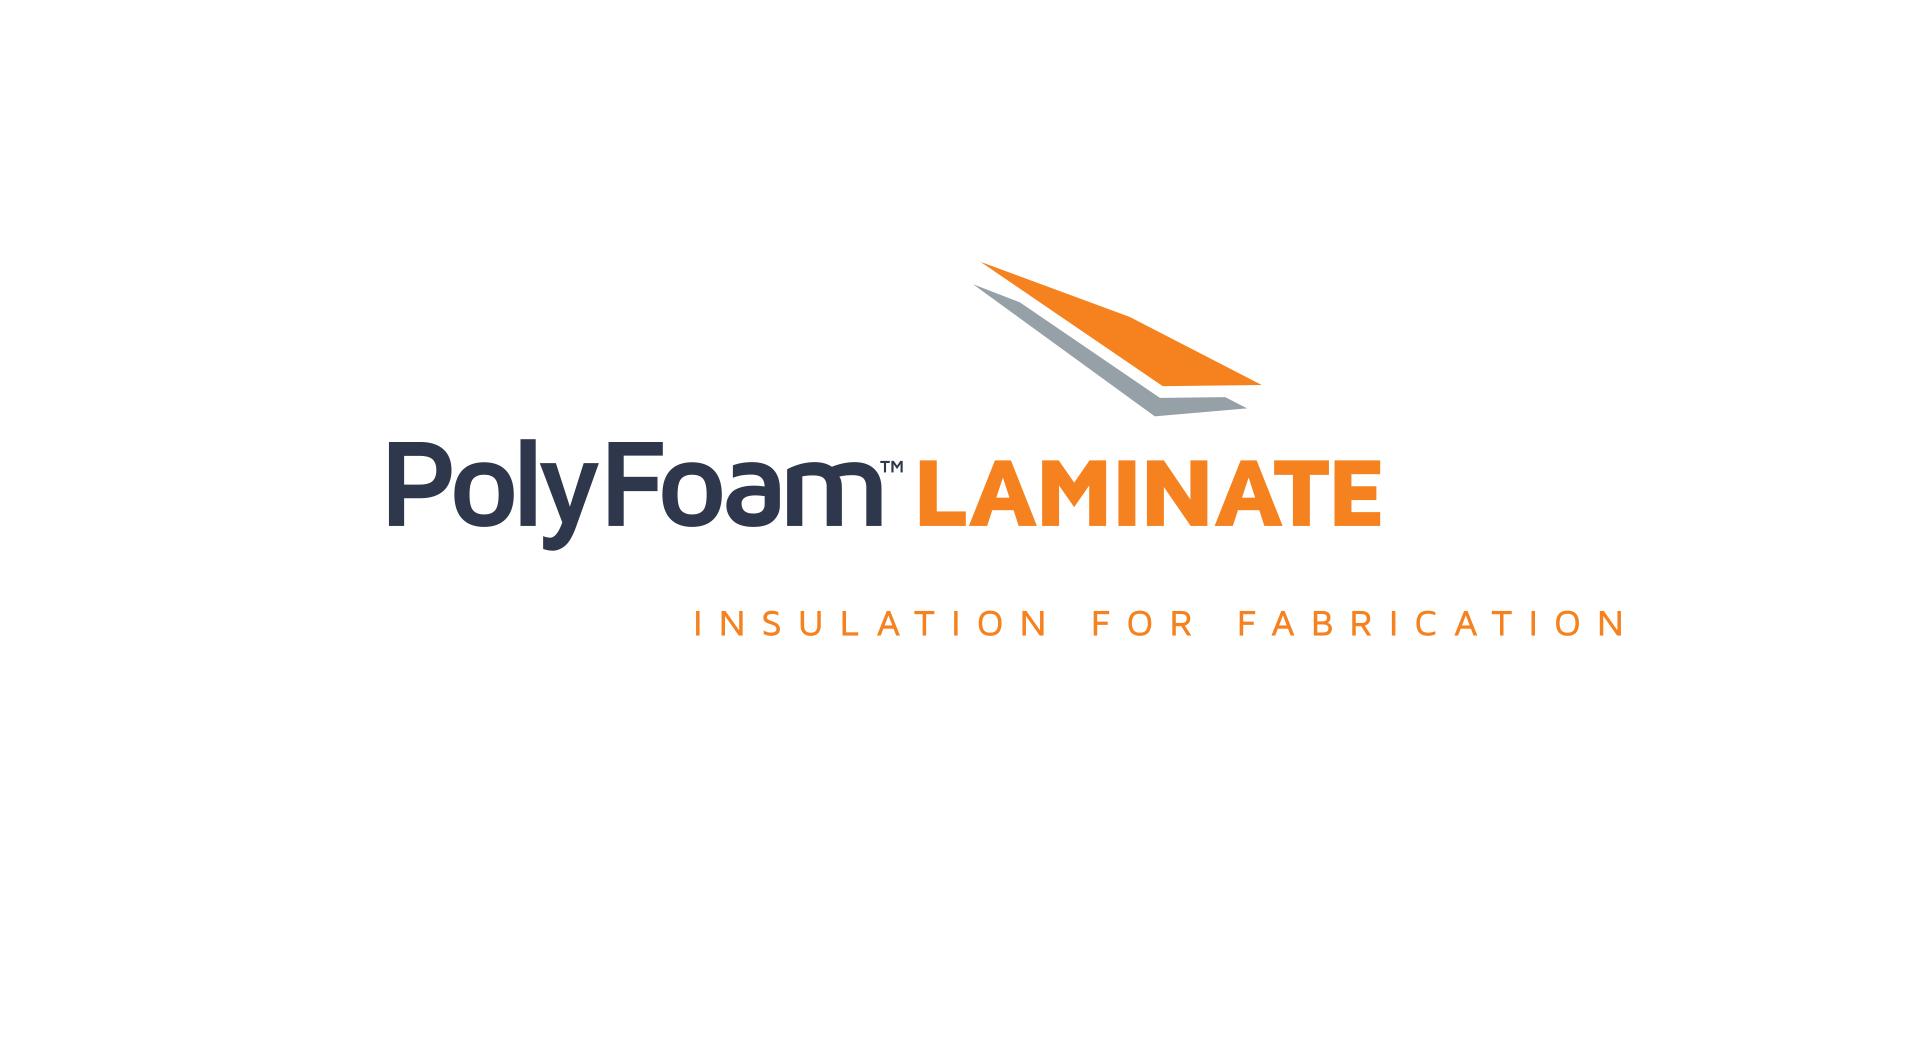 Polyfoam brand